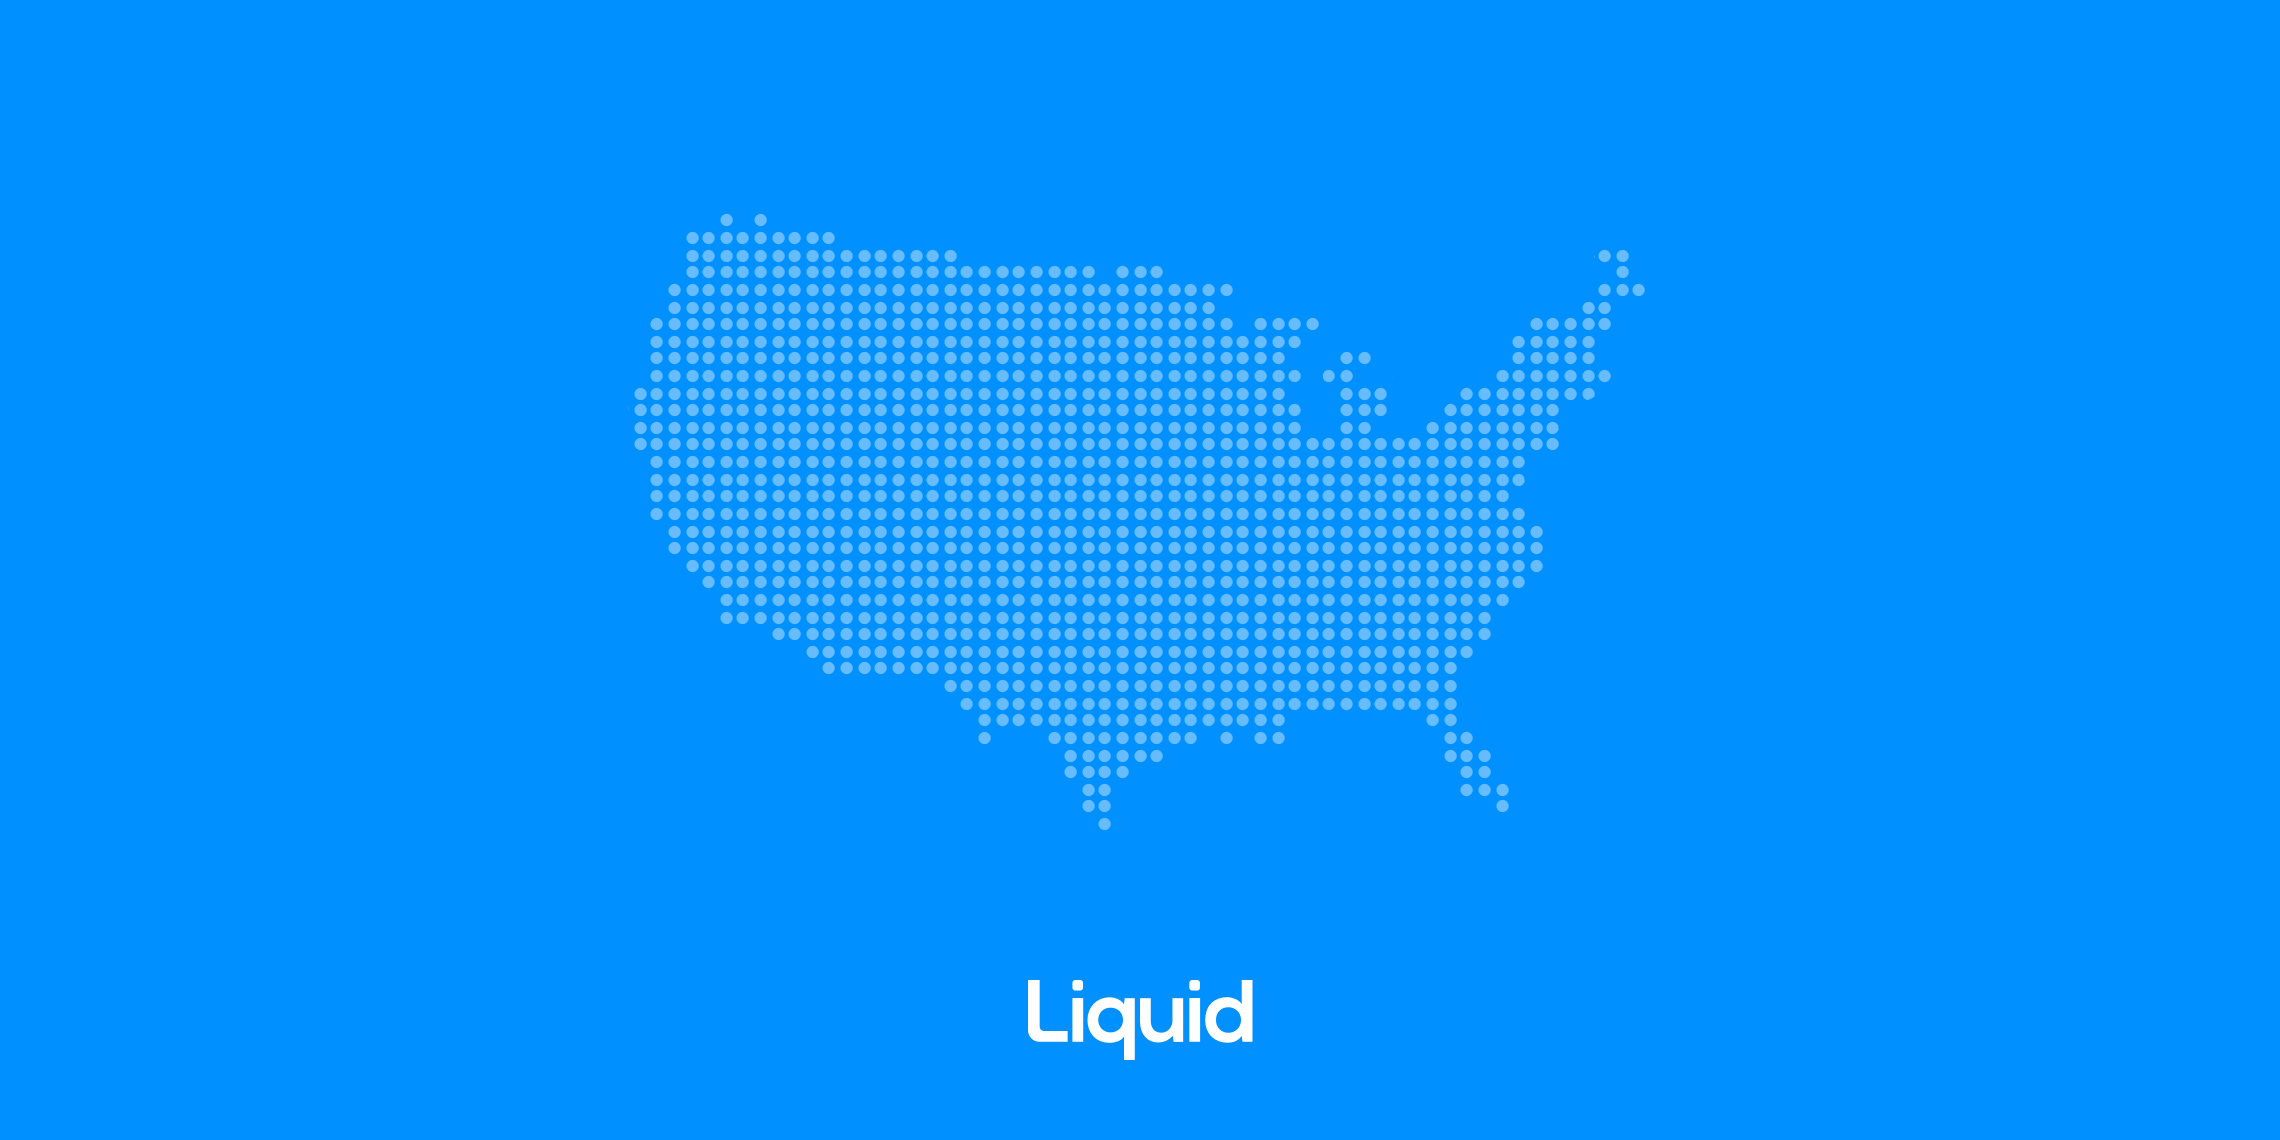 Liquid、米国市場進出を発表 - リキッドグループとバーチャルカレンシーパートナーズ、合弁会社を設立し米国市場進出へ -